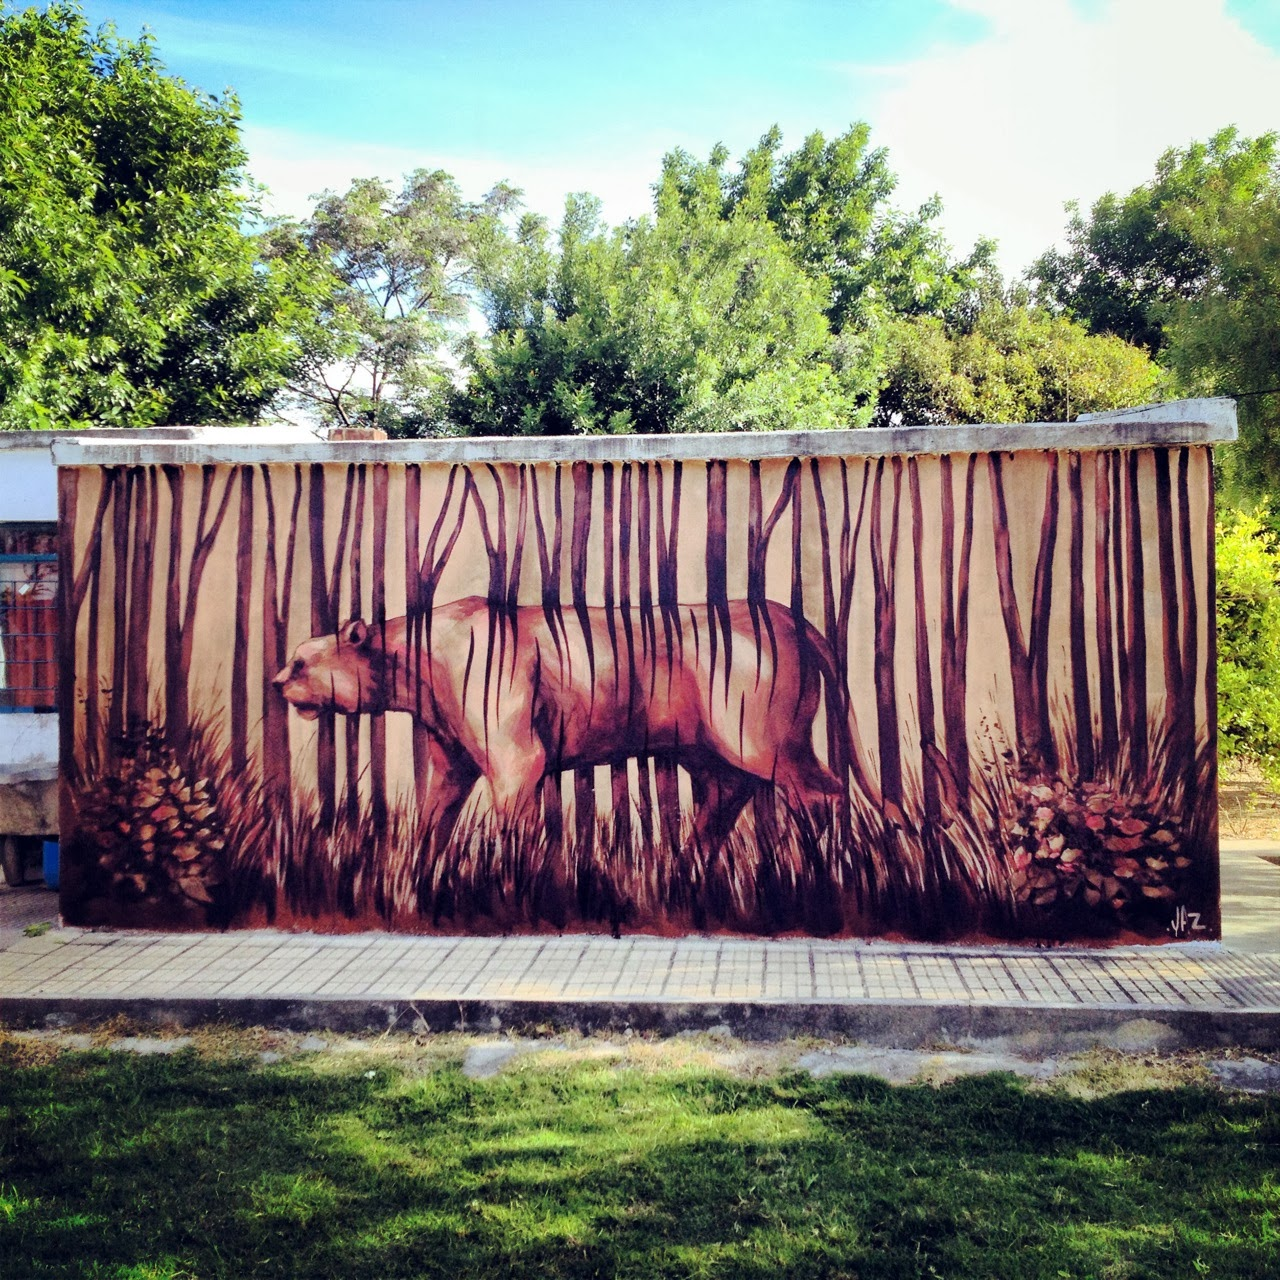 jaz-new-mural-villa-soriano-uruguay-01